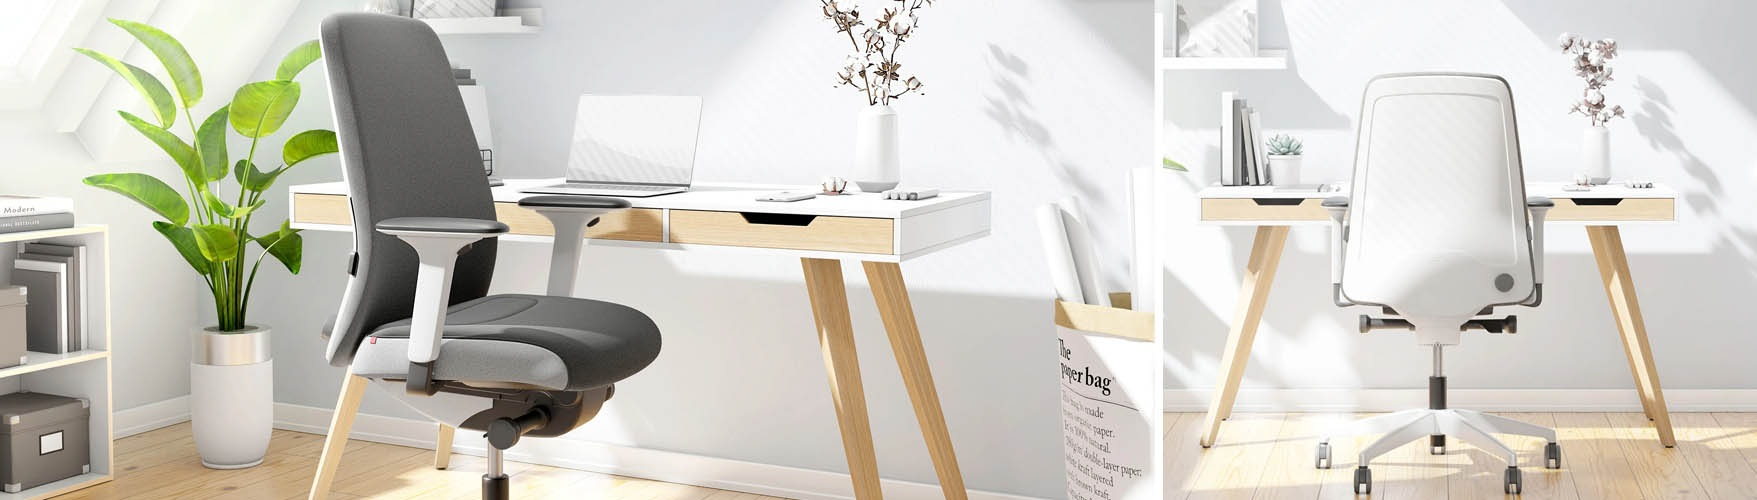 interstuhl-every-interior-edition-grau-banner